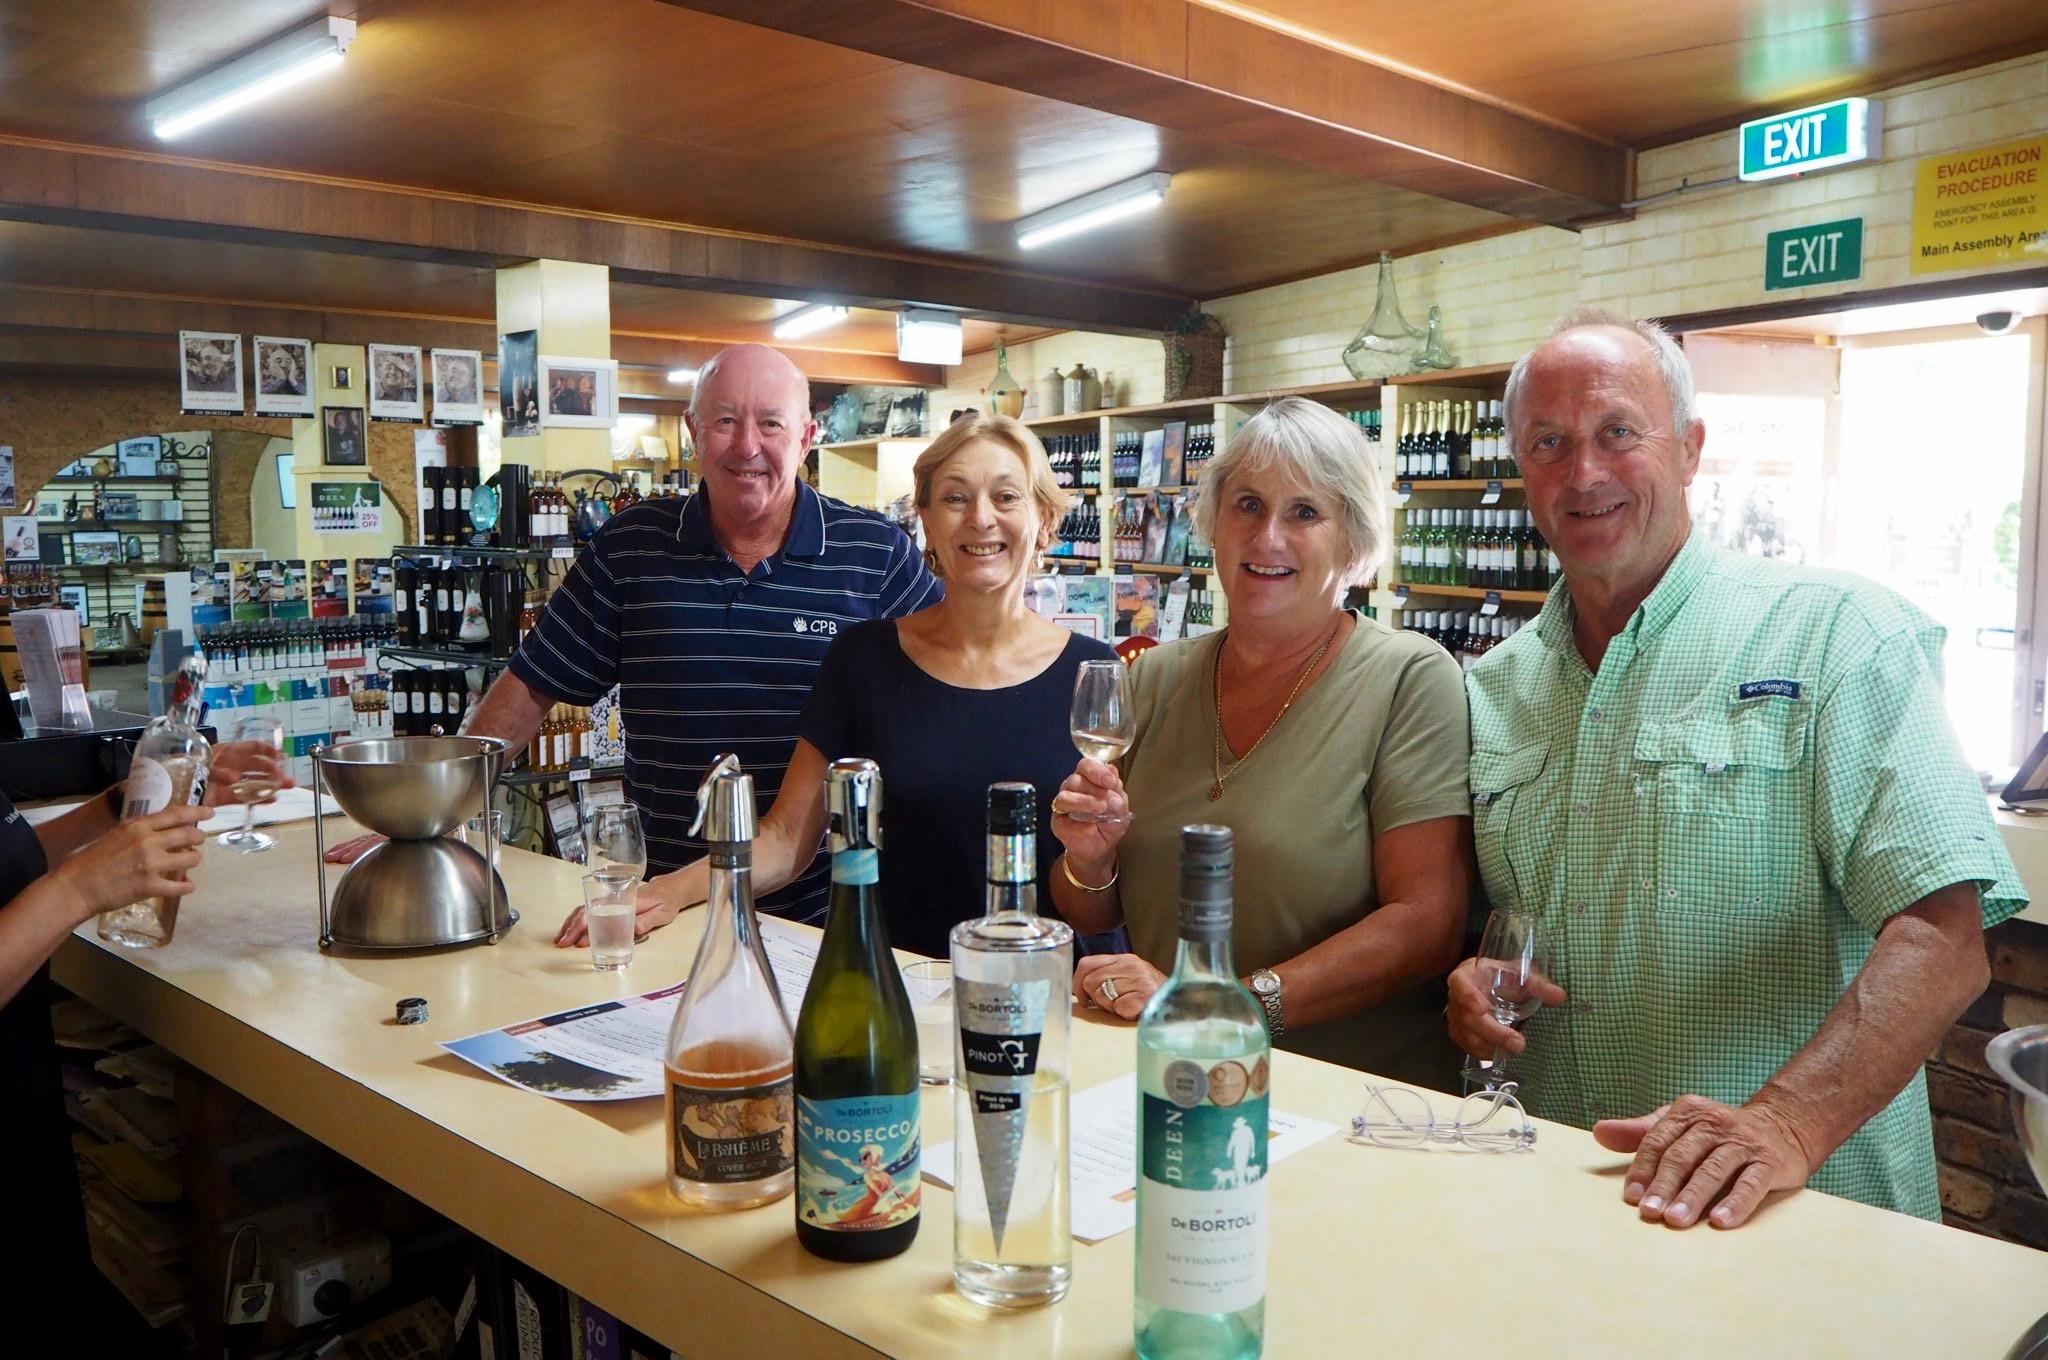 Gourmet Food & Wine Indulgence Tour - Monday to Friday